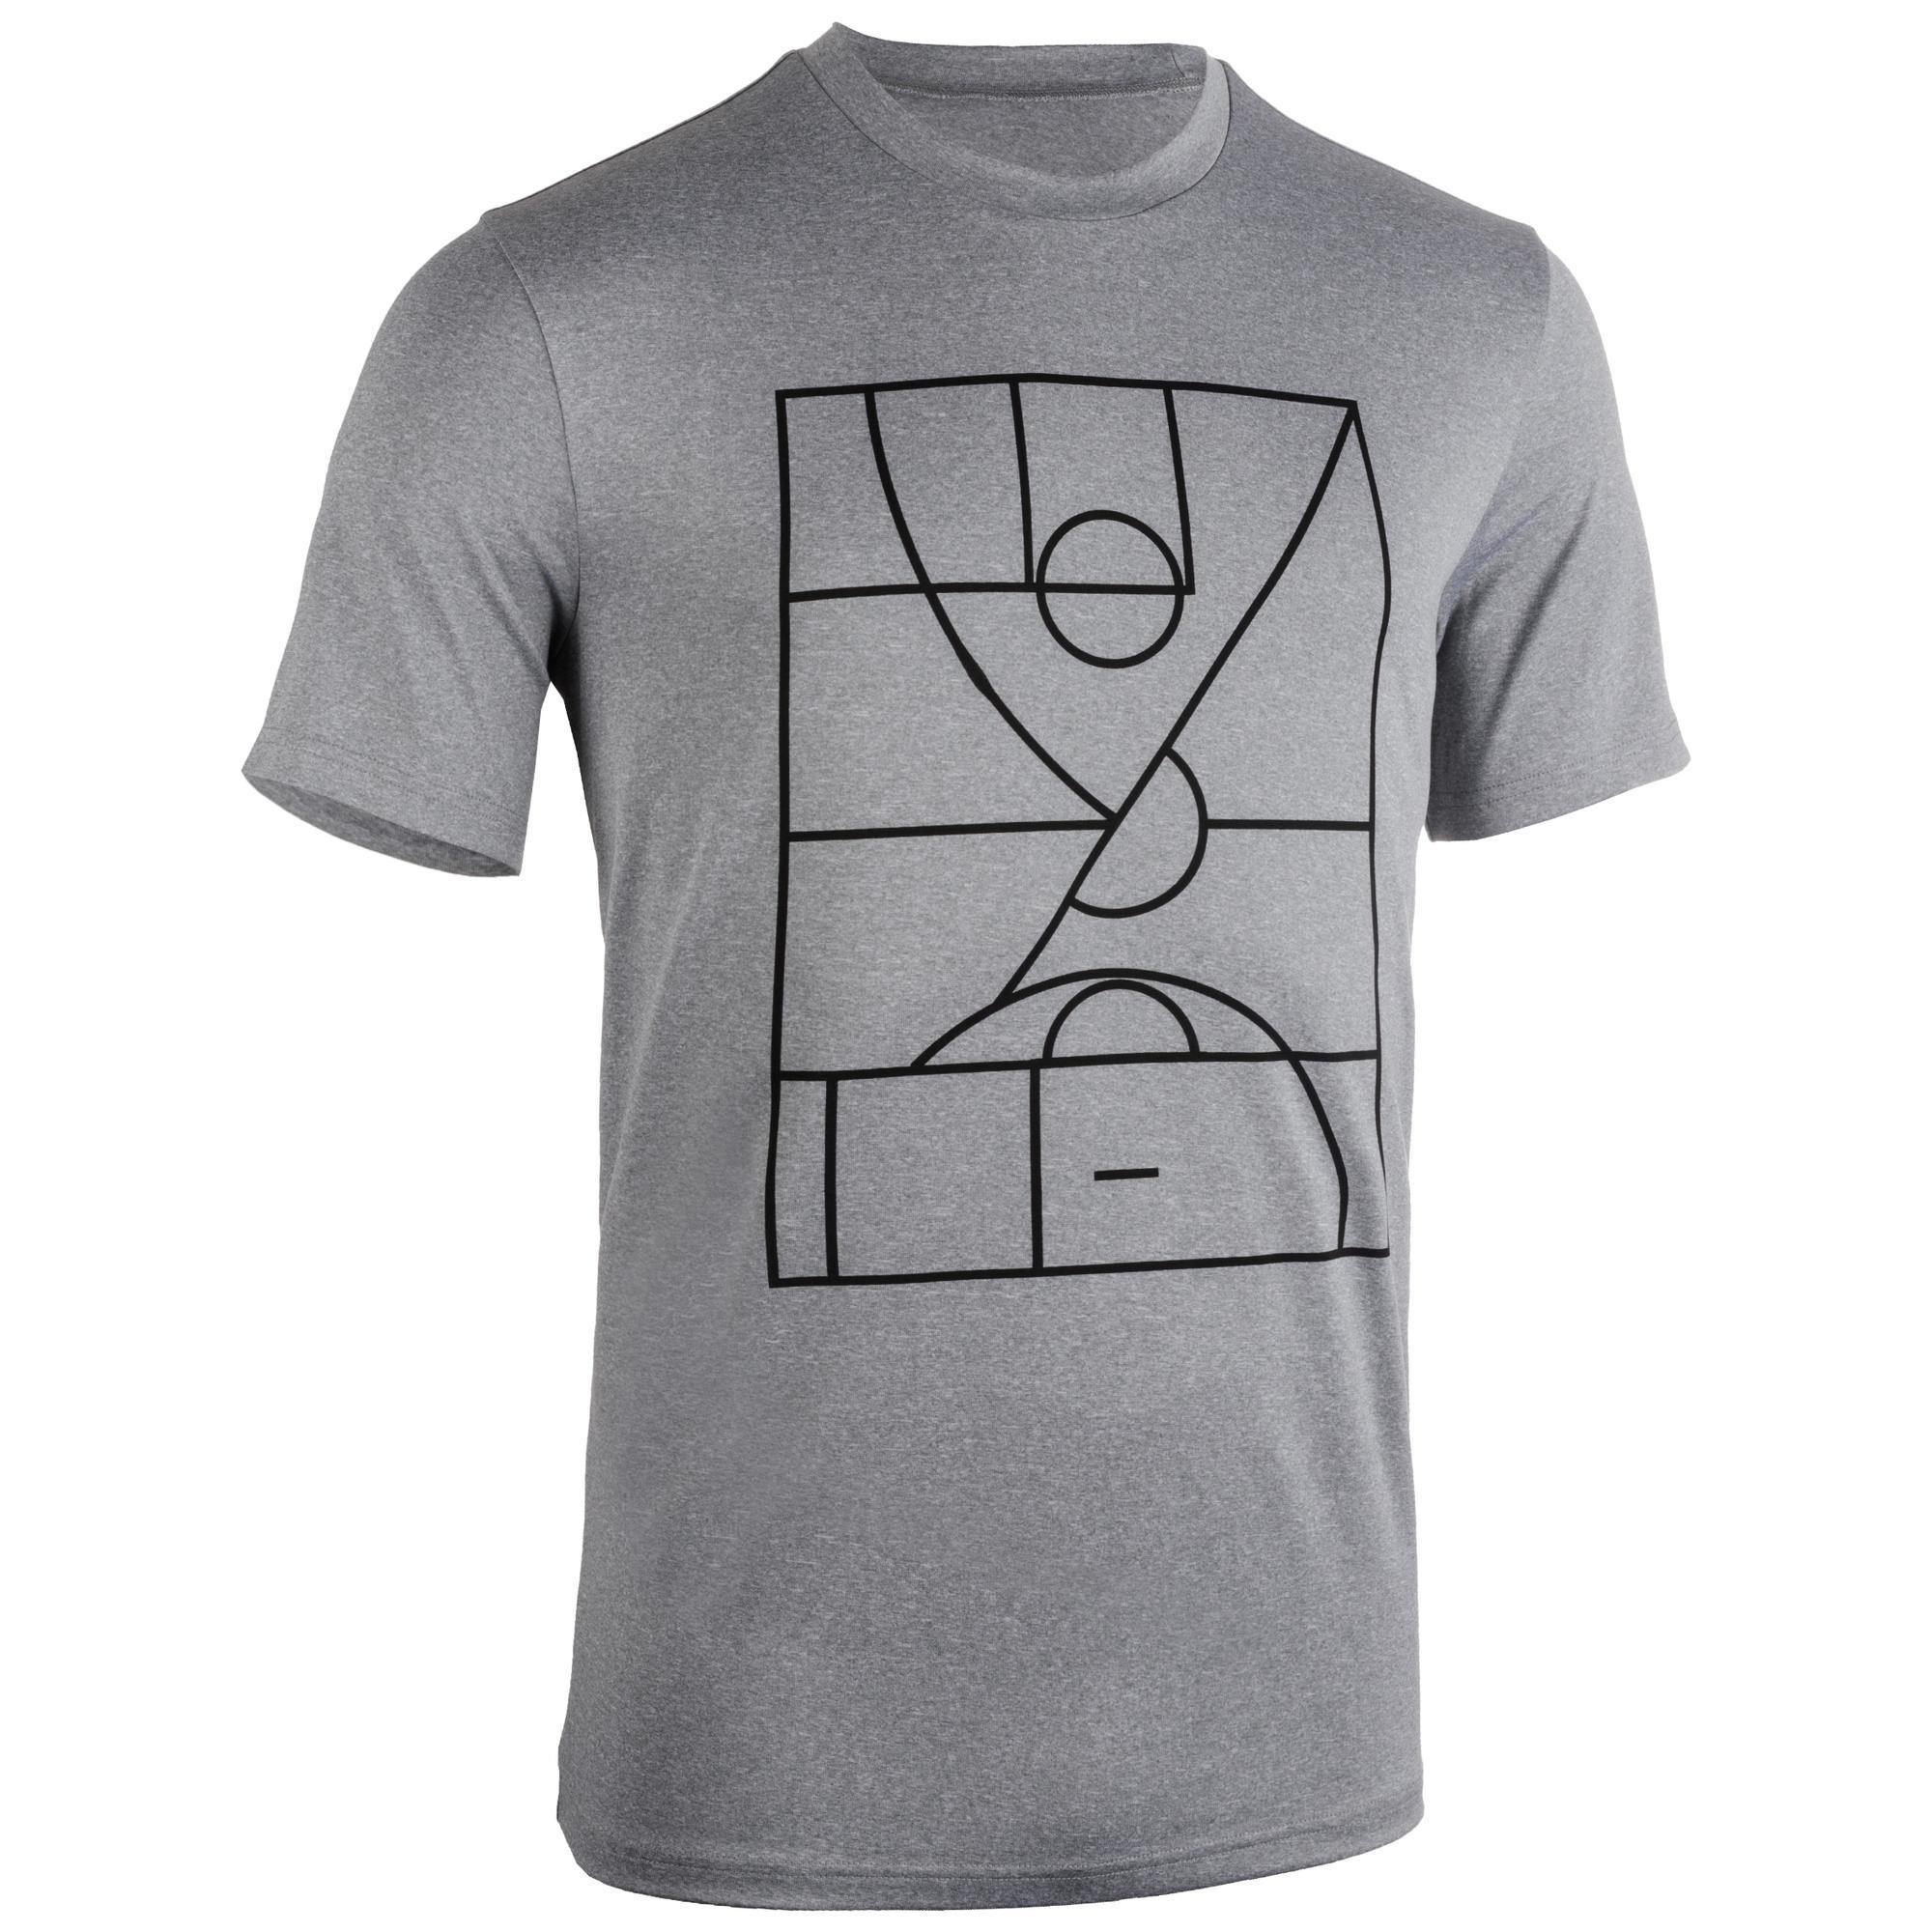 Basketballtrikot TS500 Herren hellgrau Playground | Sportbekleidung > Trikots > Basketballtrikots | Grau | Tarmak